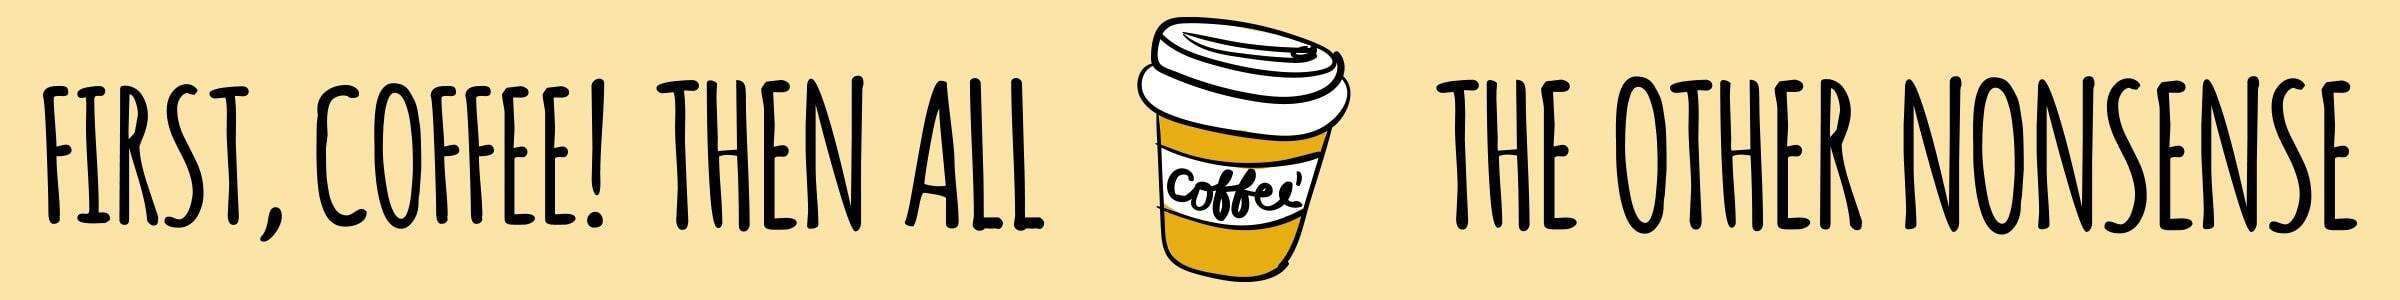 Category_Teaser_Header_Kaffee_2400x300